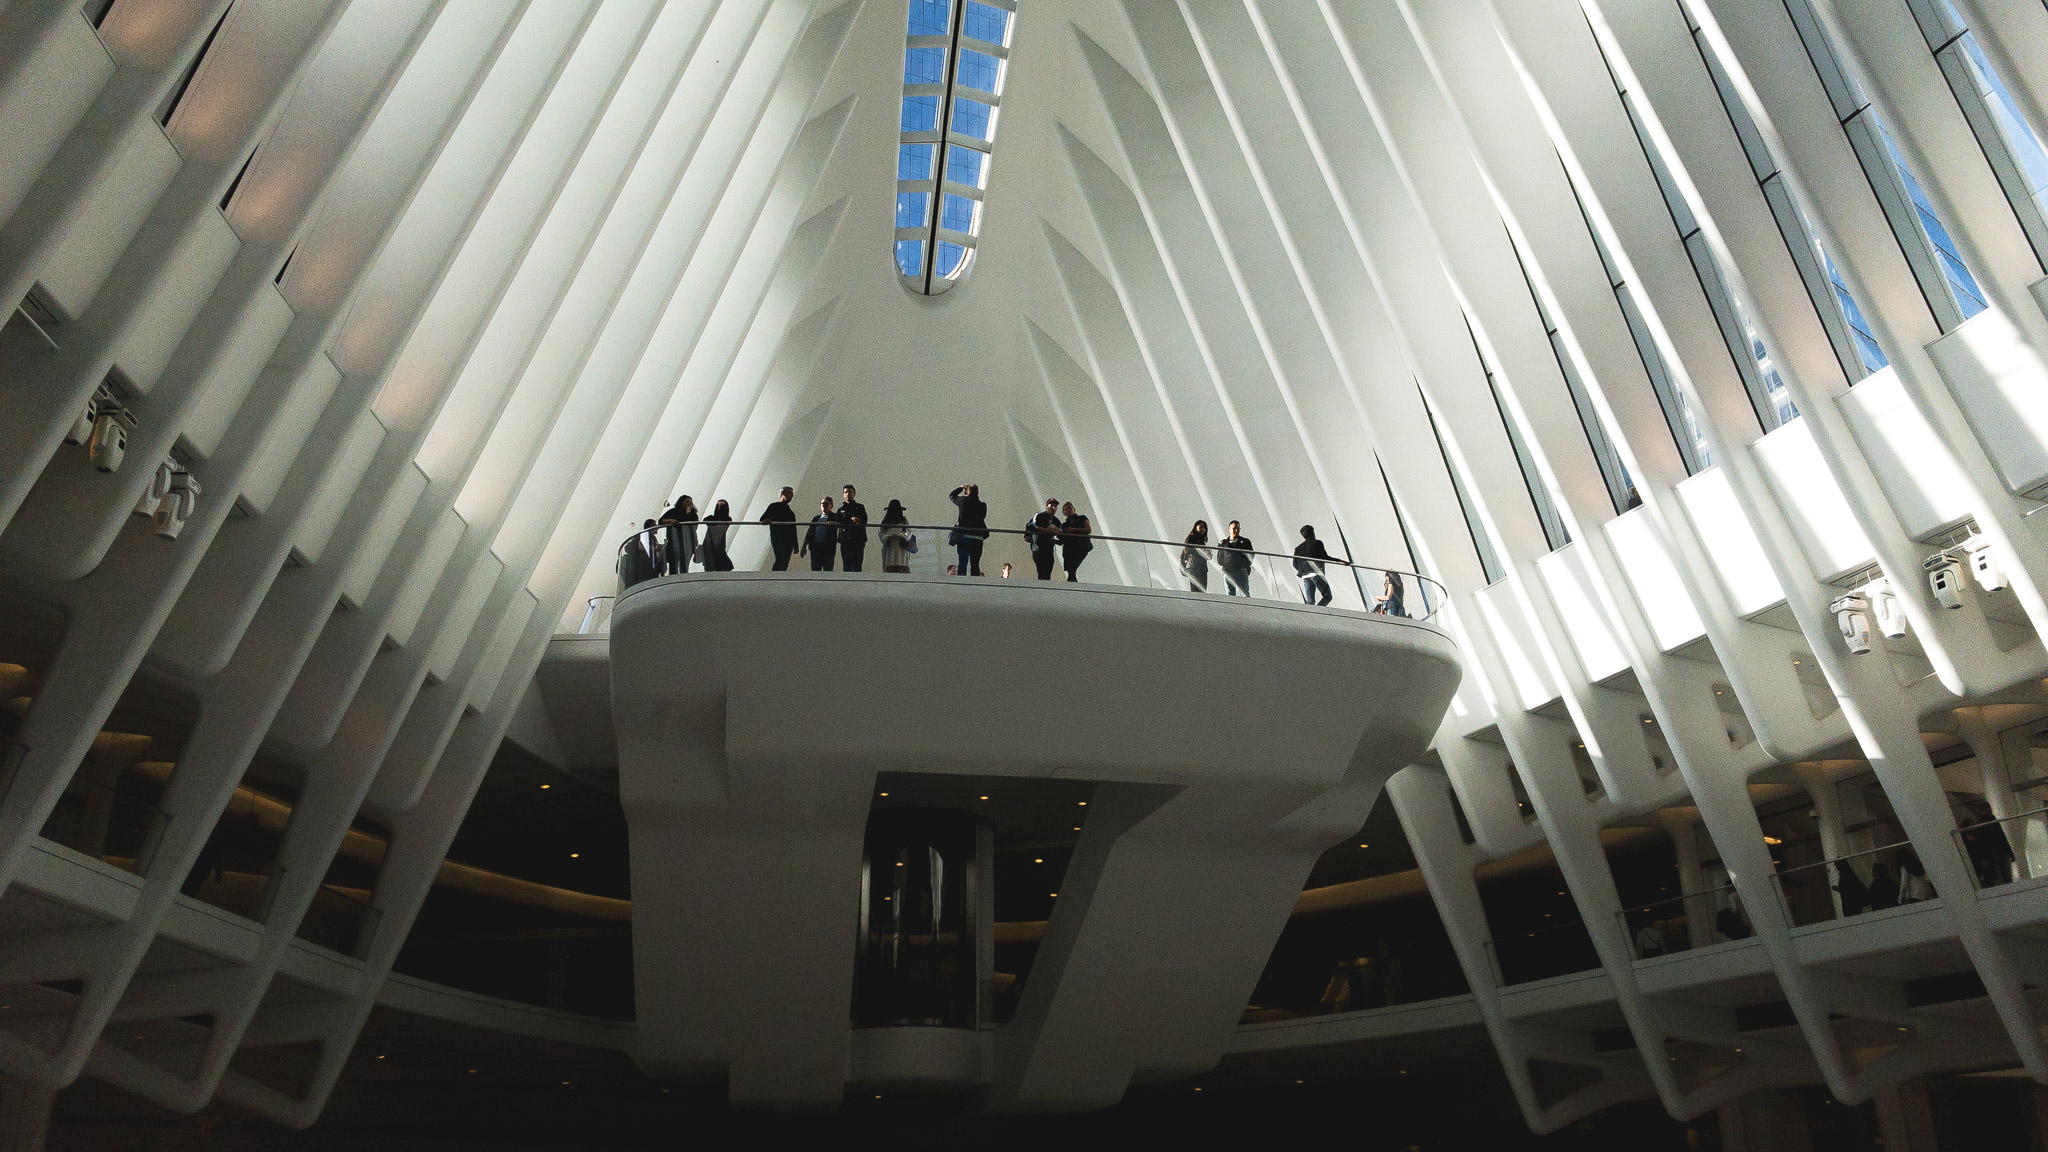 simon-abrams-oculus-3.jpg